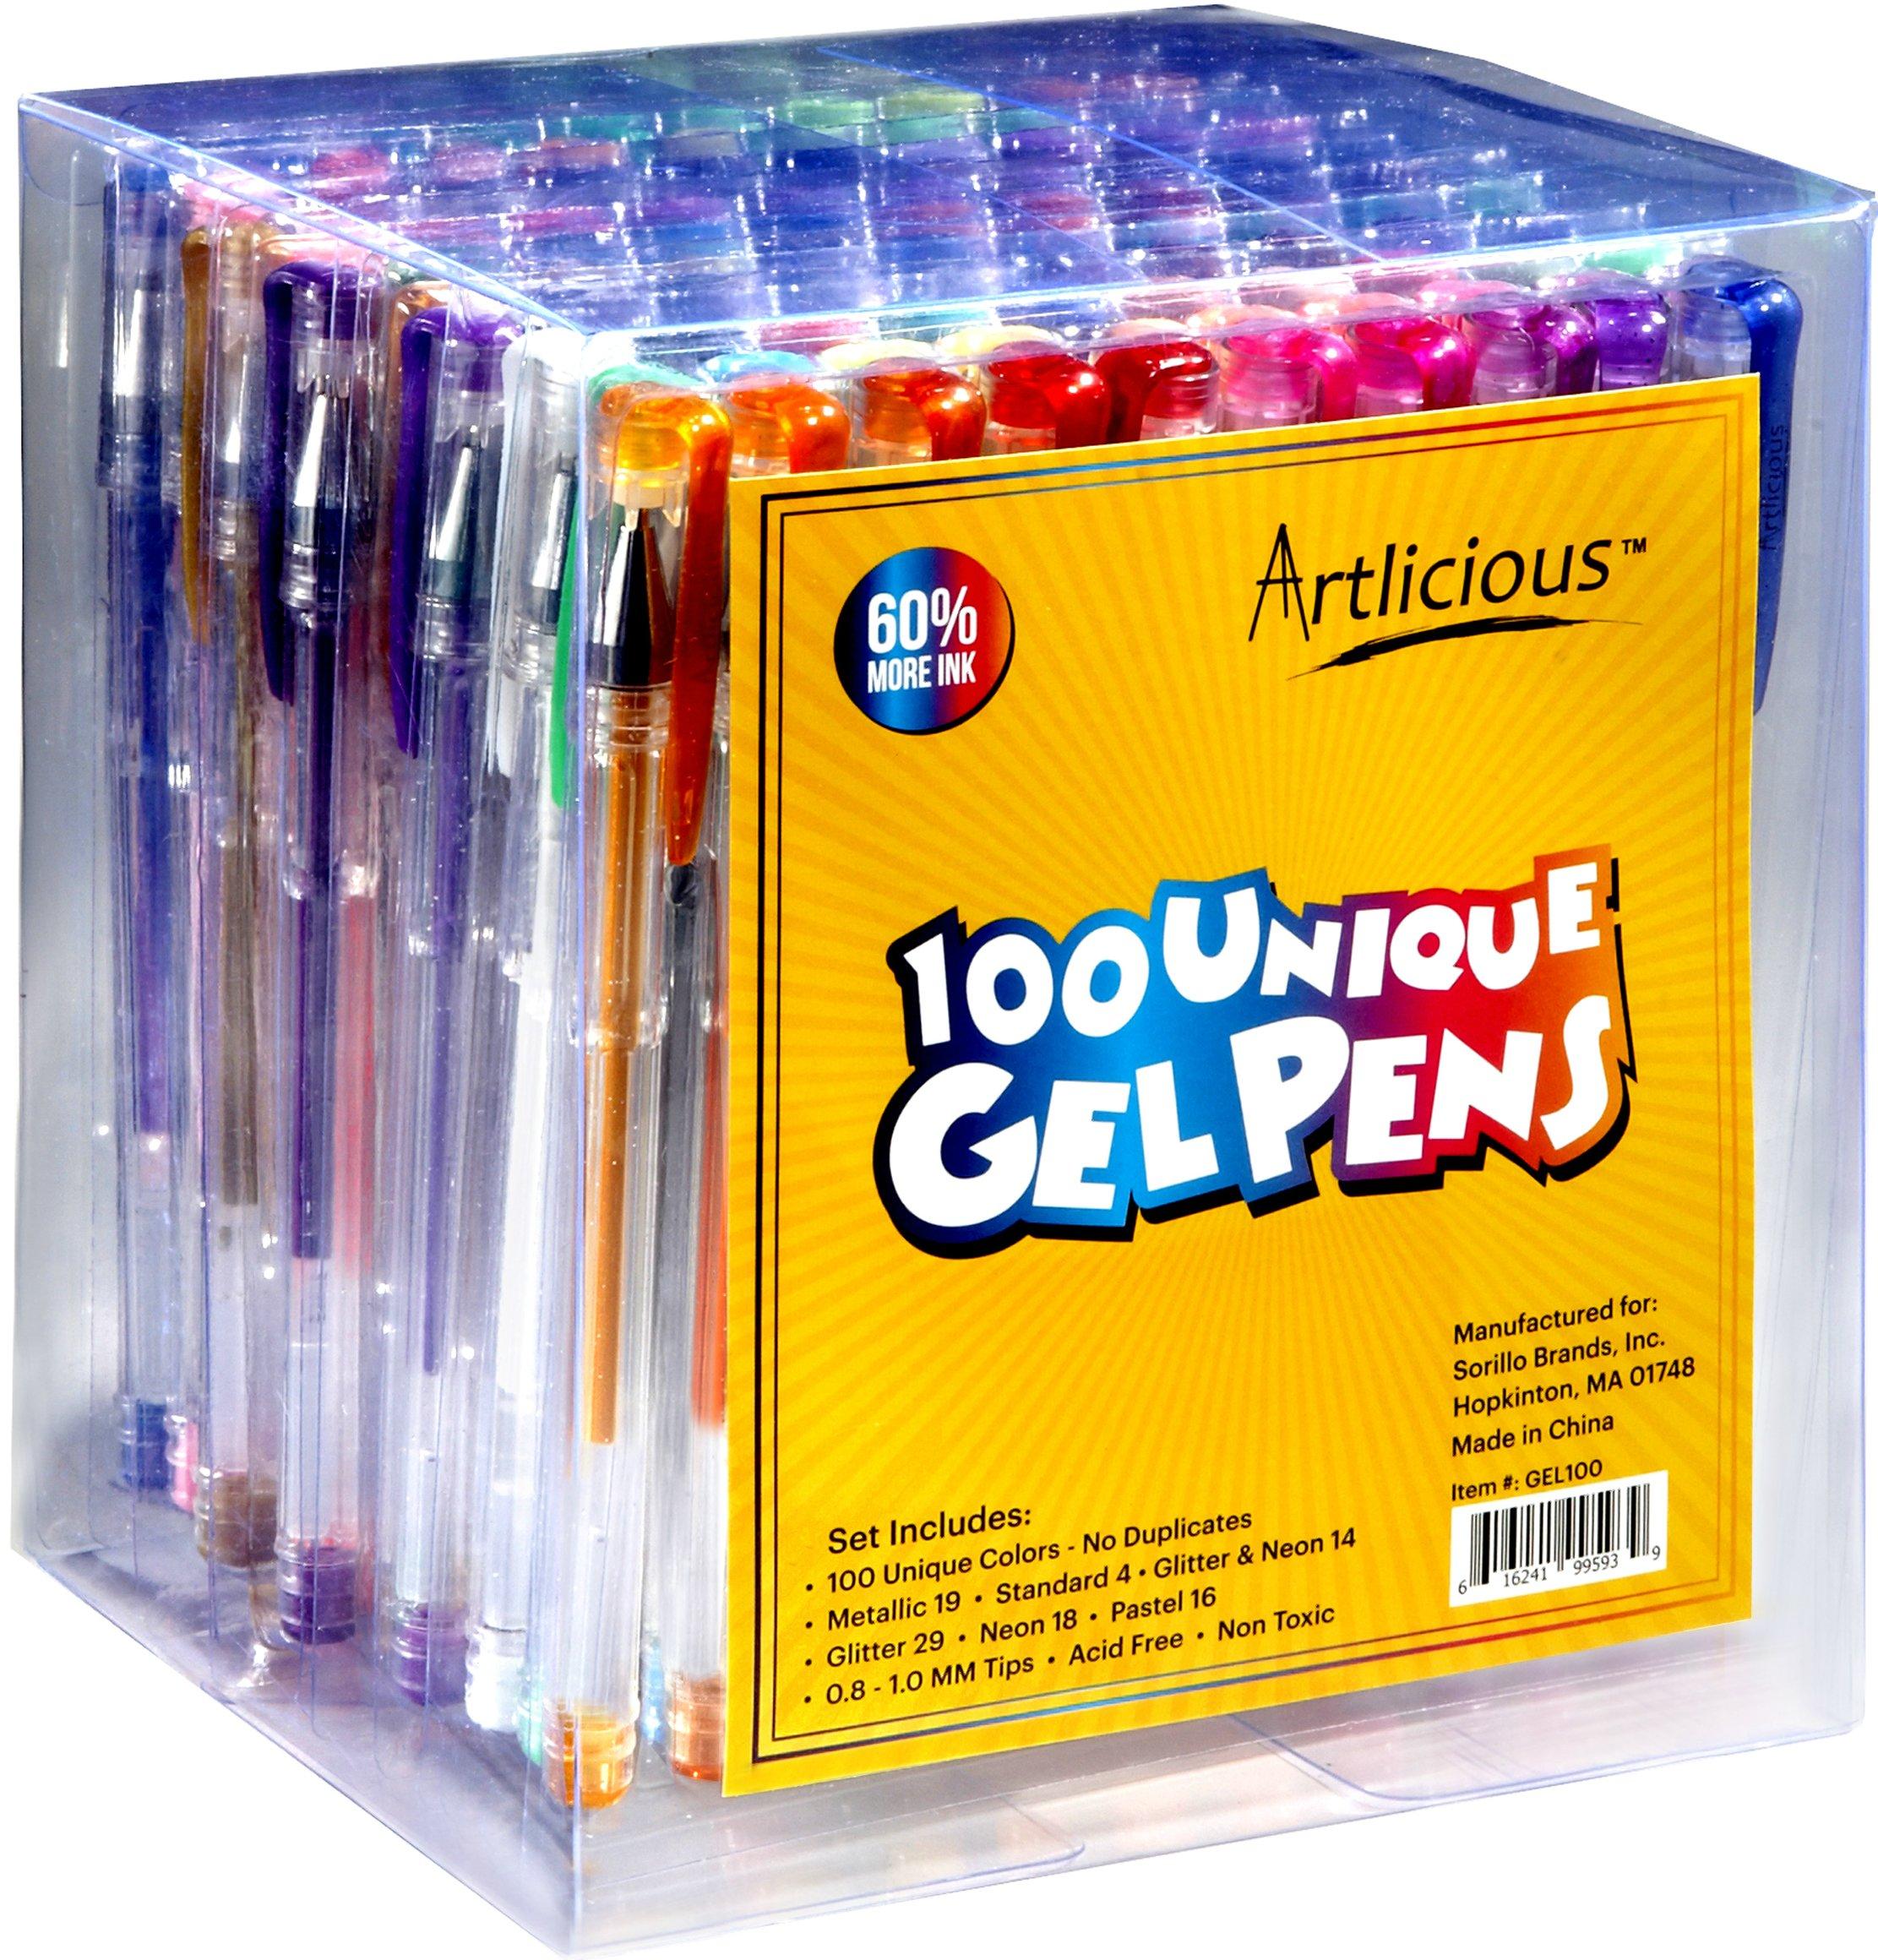 Artlicious - Ultimate 100 Unique Gel Pens Set - No Duplicates - 60% More Ink .. 14